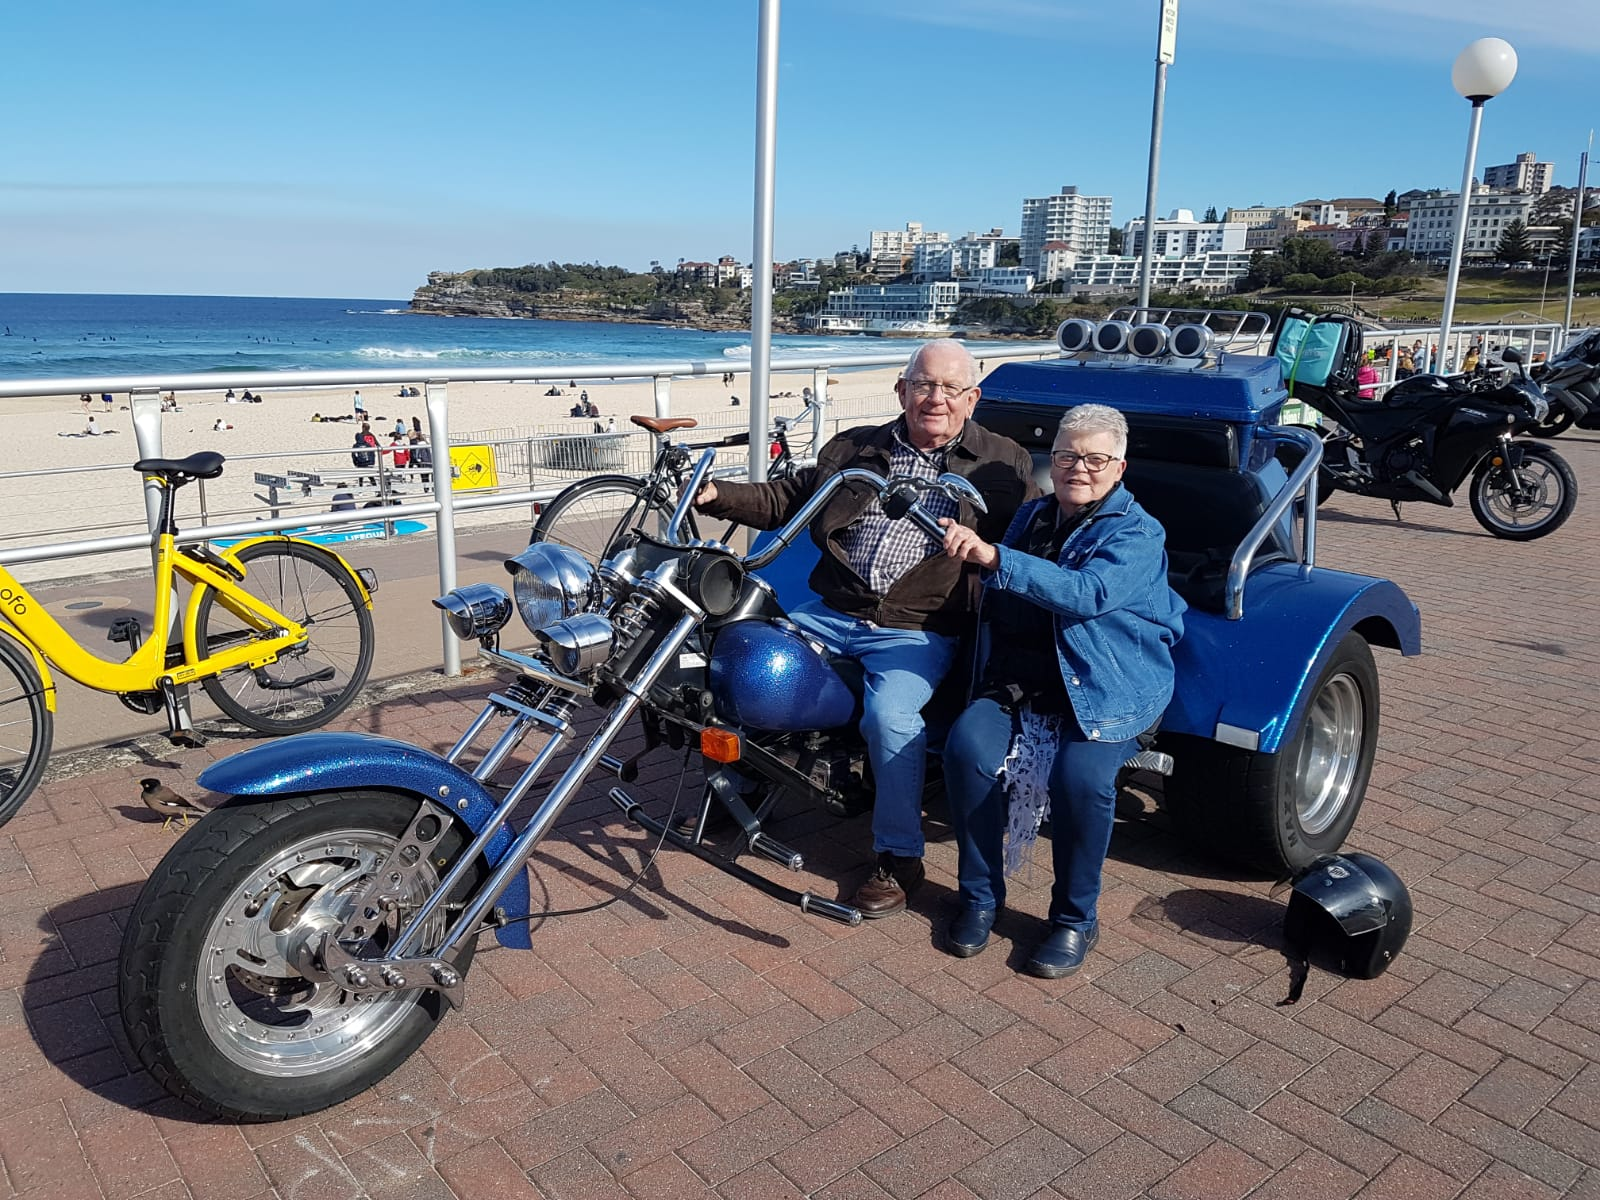 trike tour to celebrate 40th birthday and wedding anniversary